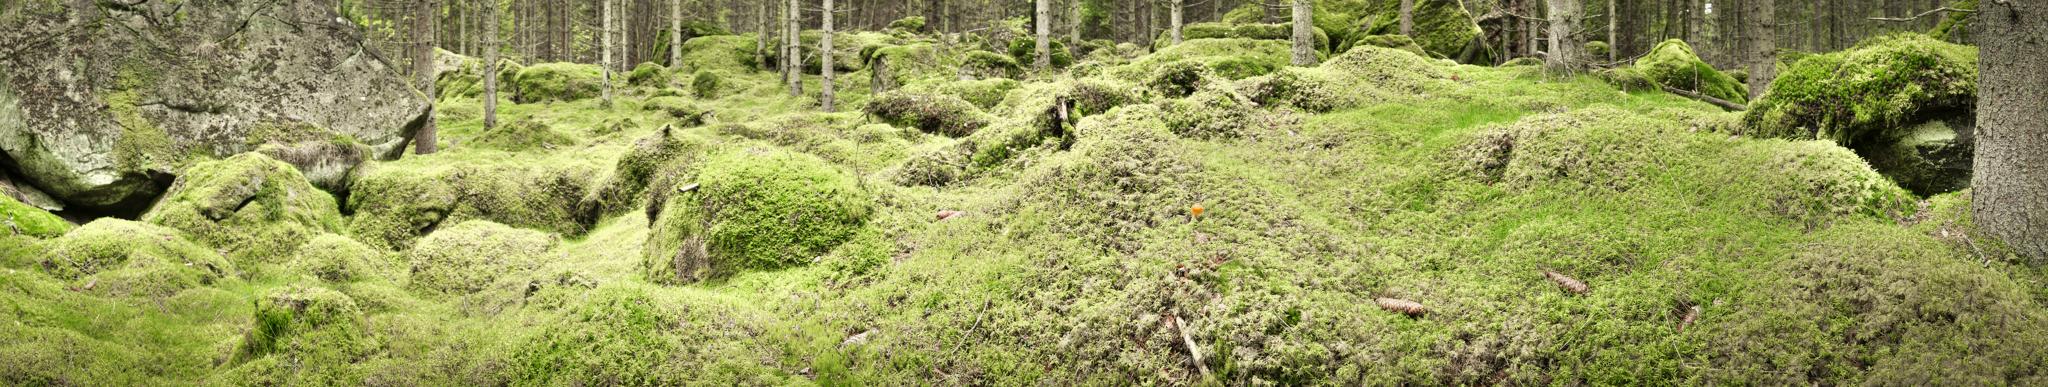 Olofstrom_fairies_wood_2K-2